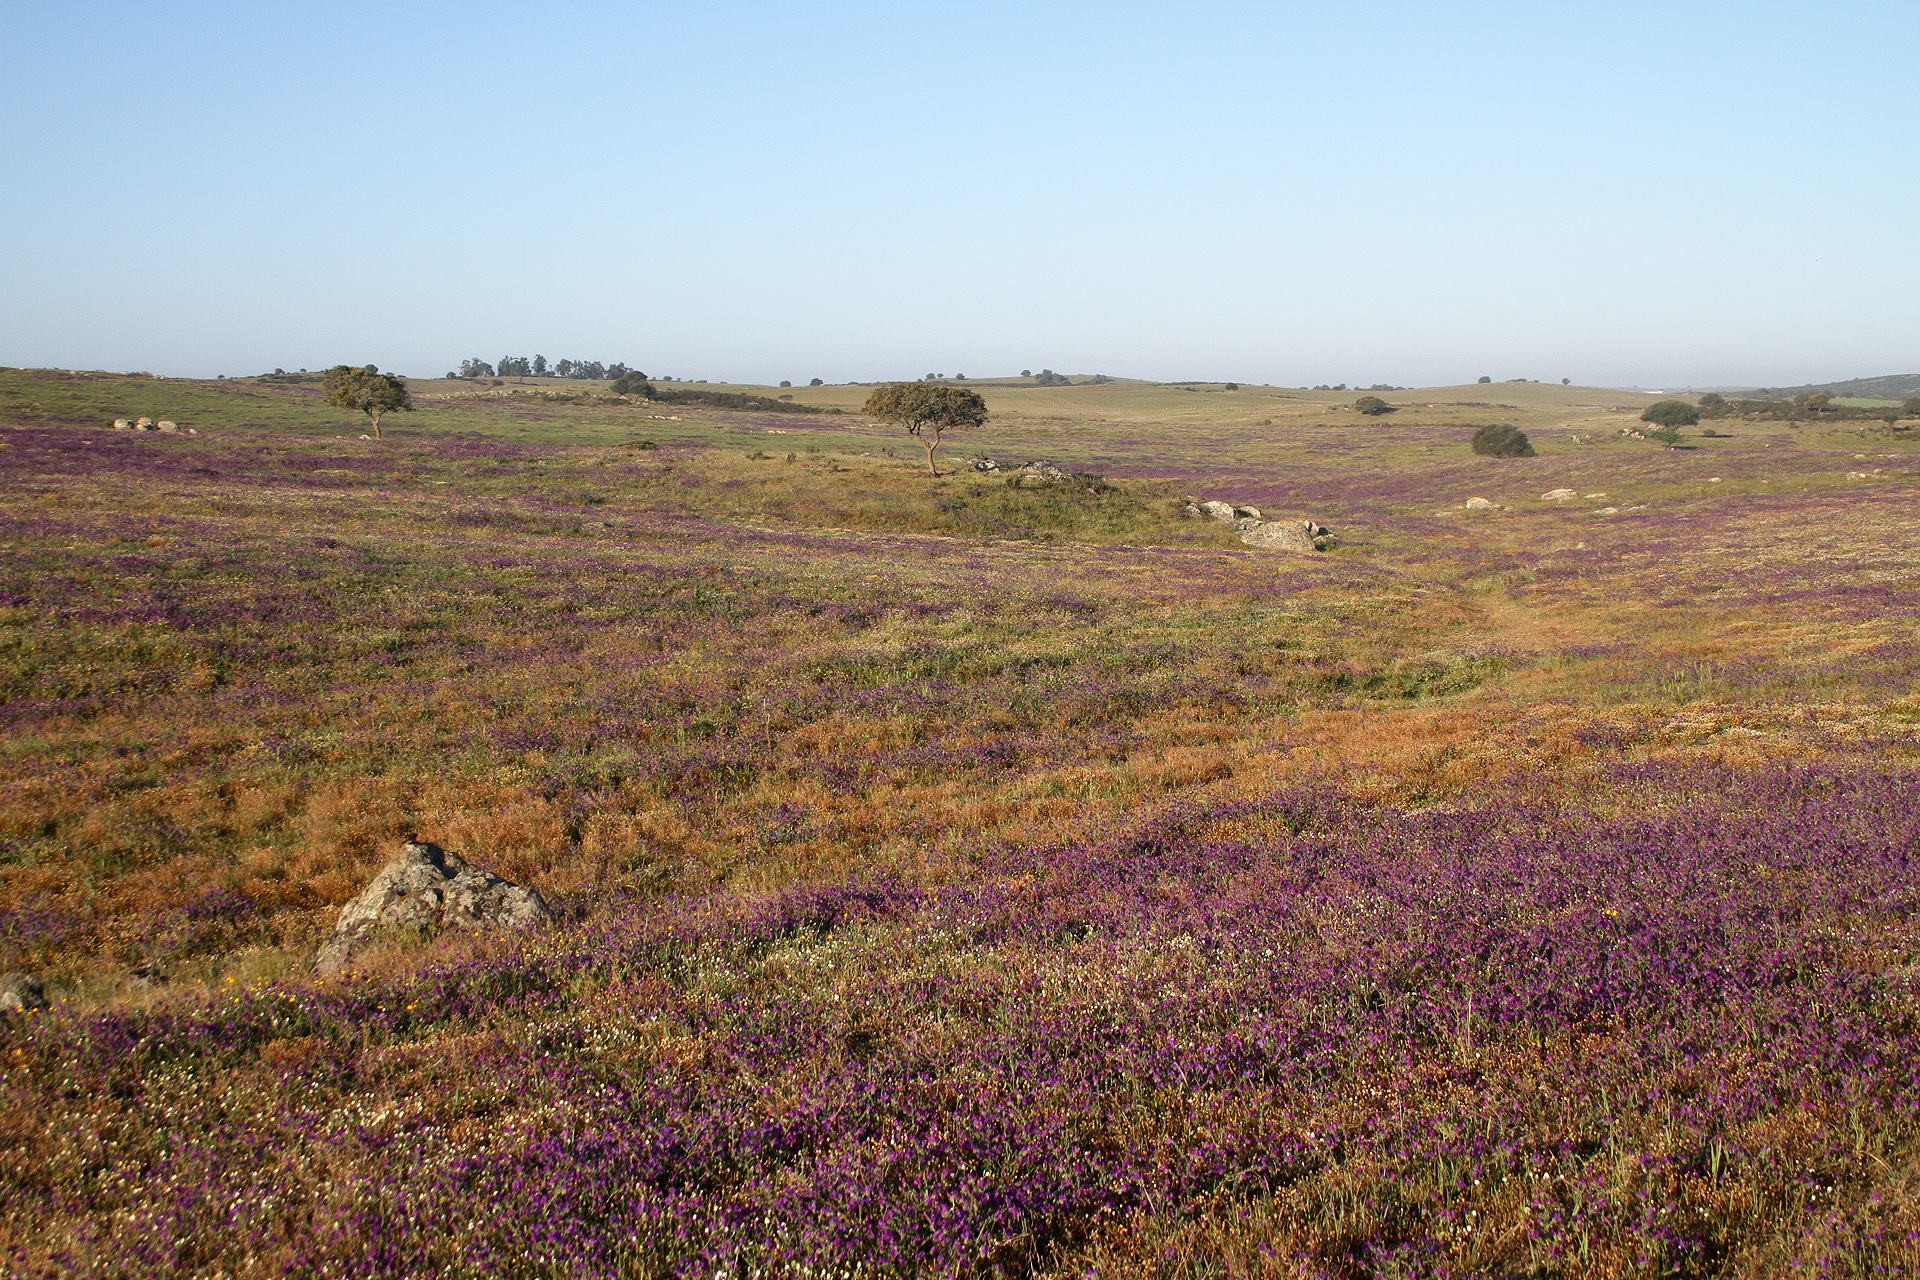 Die Grassteppen-Landschaft um Castro Verde, anfangs April ein Blumenmeer.